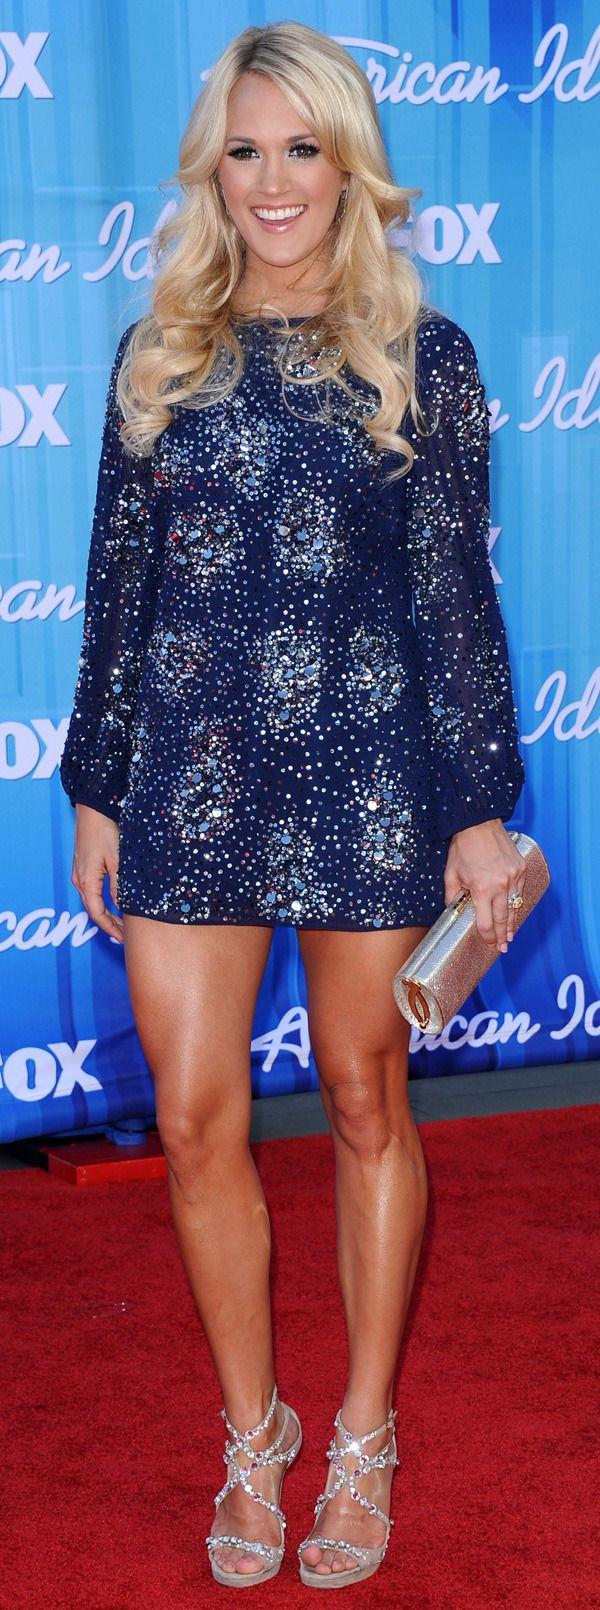 Carrie Underwood's Legs